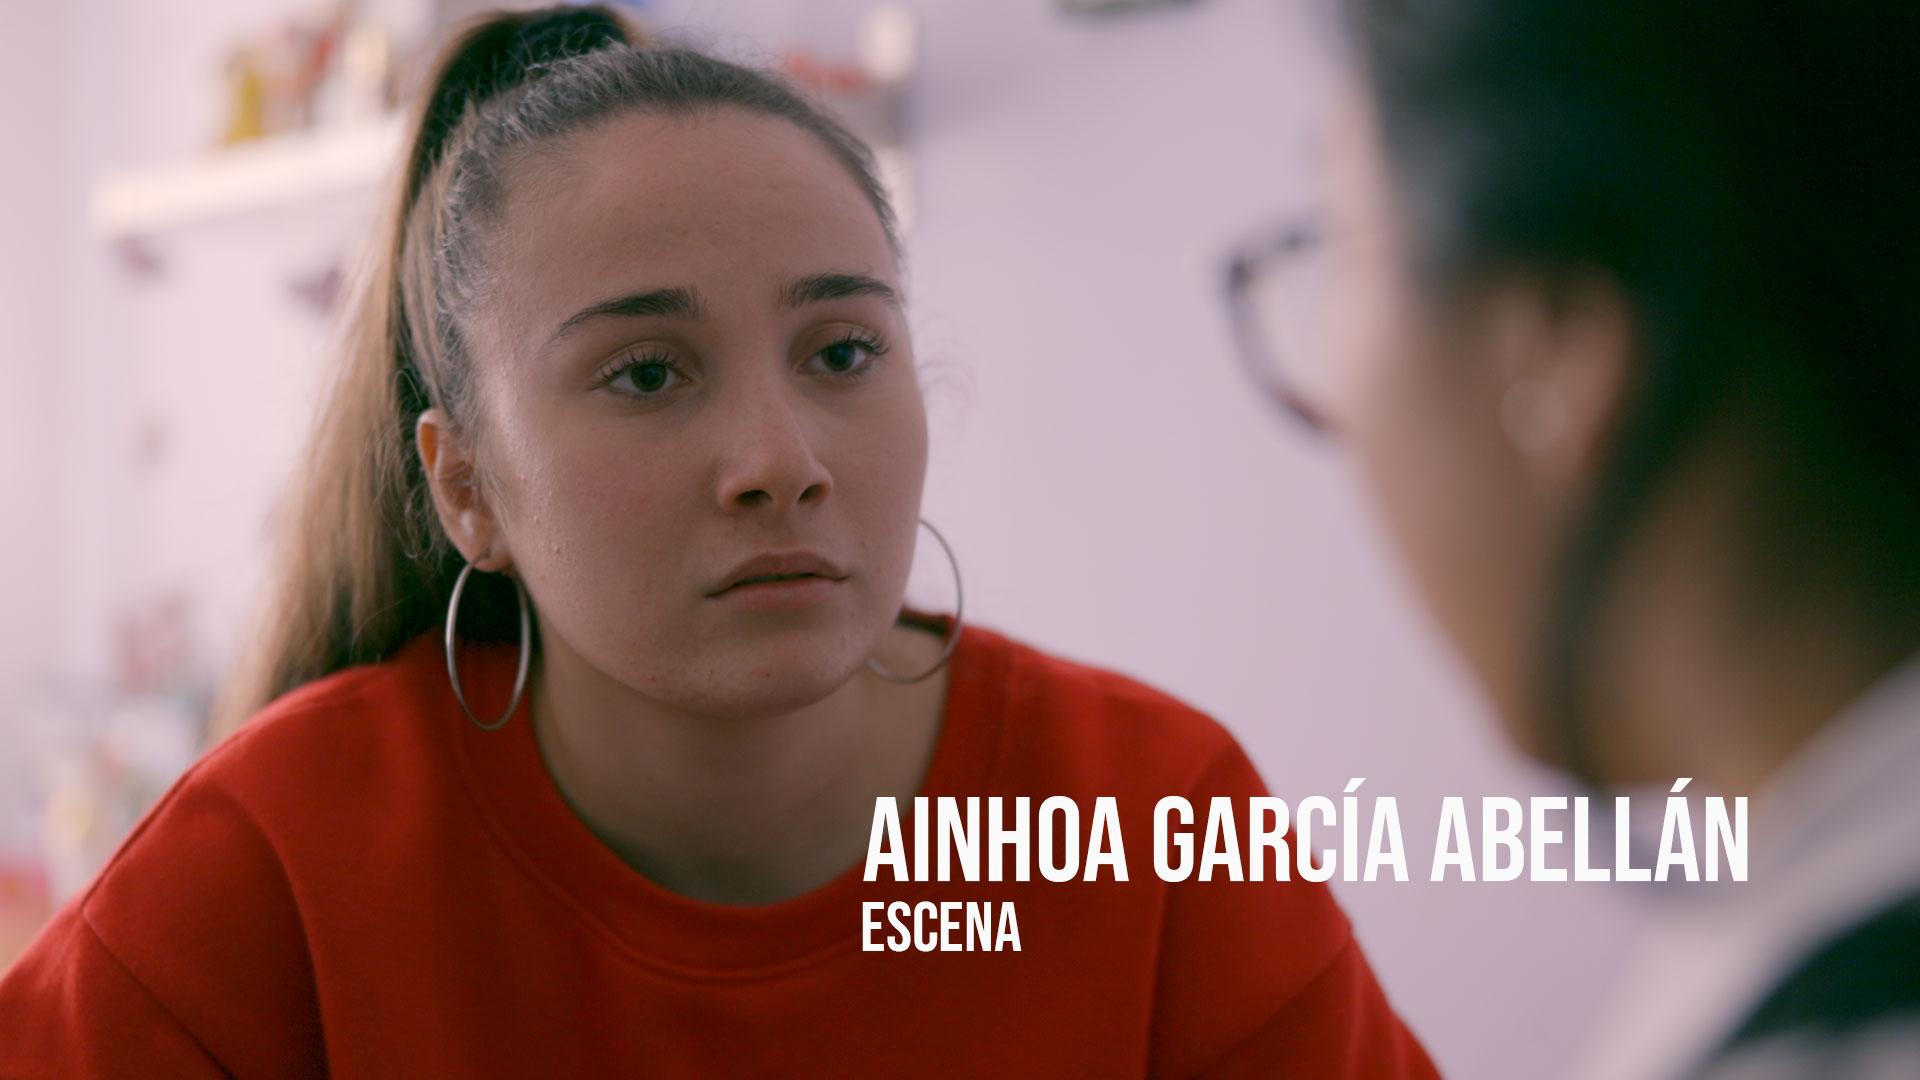 Ainhoa García Abellán - Escena Actriz